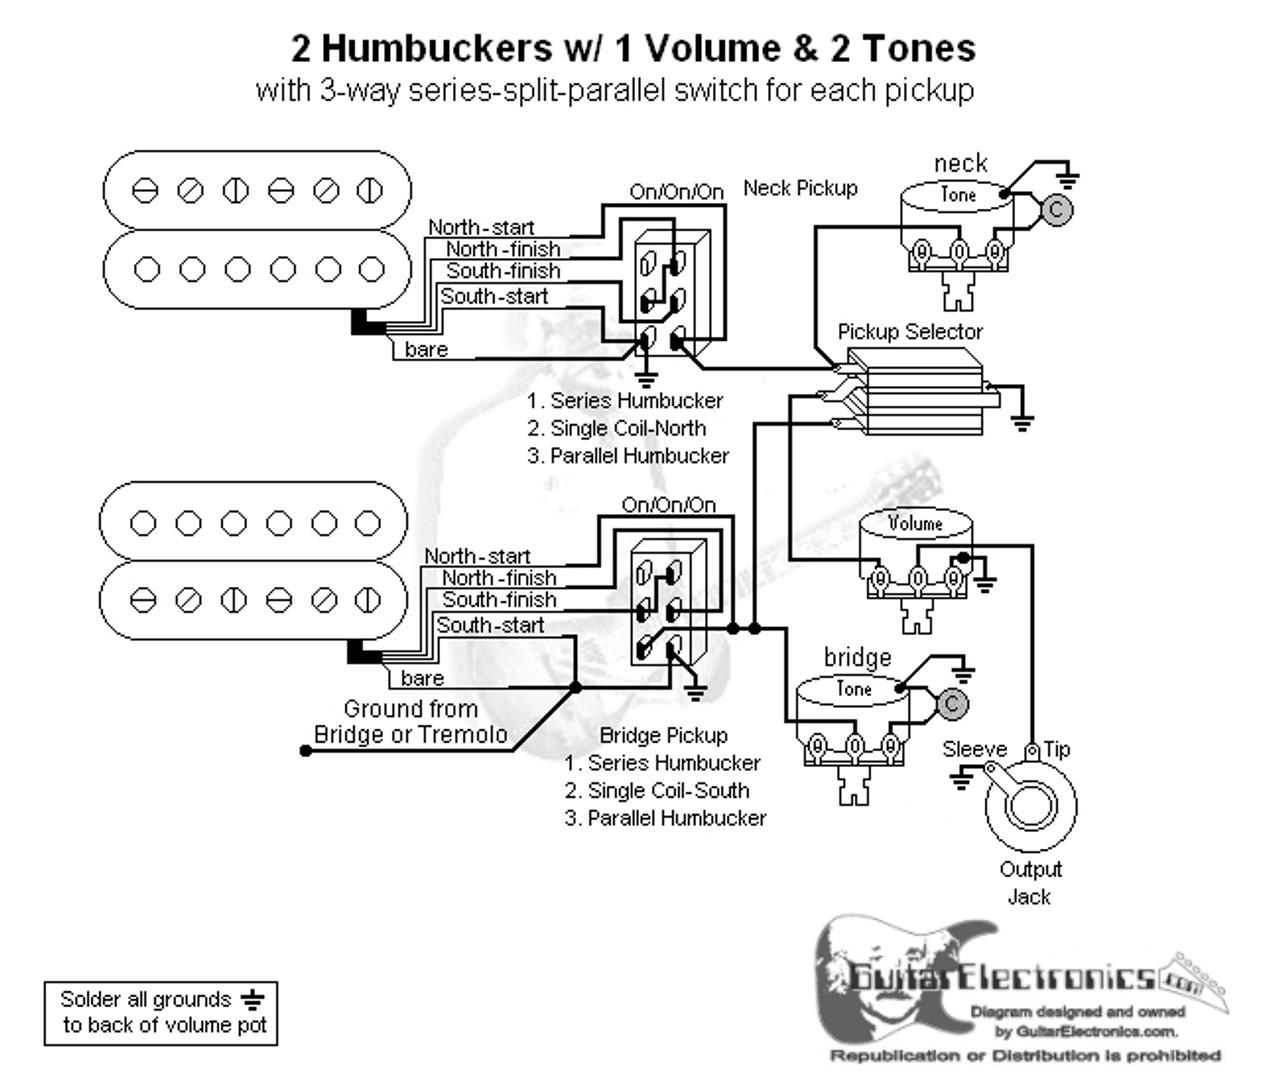 2 HBs/3-Way Toggle/1 Vol/2 Tones/Series-Split-Parallel